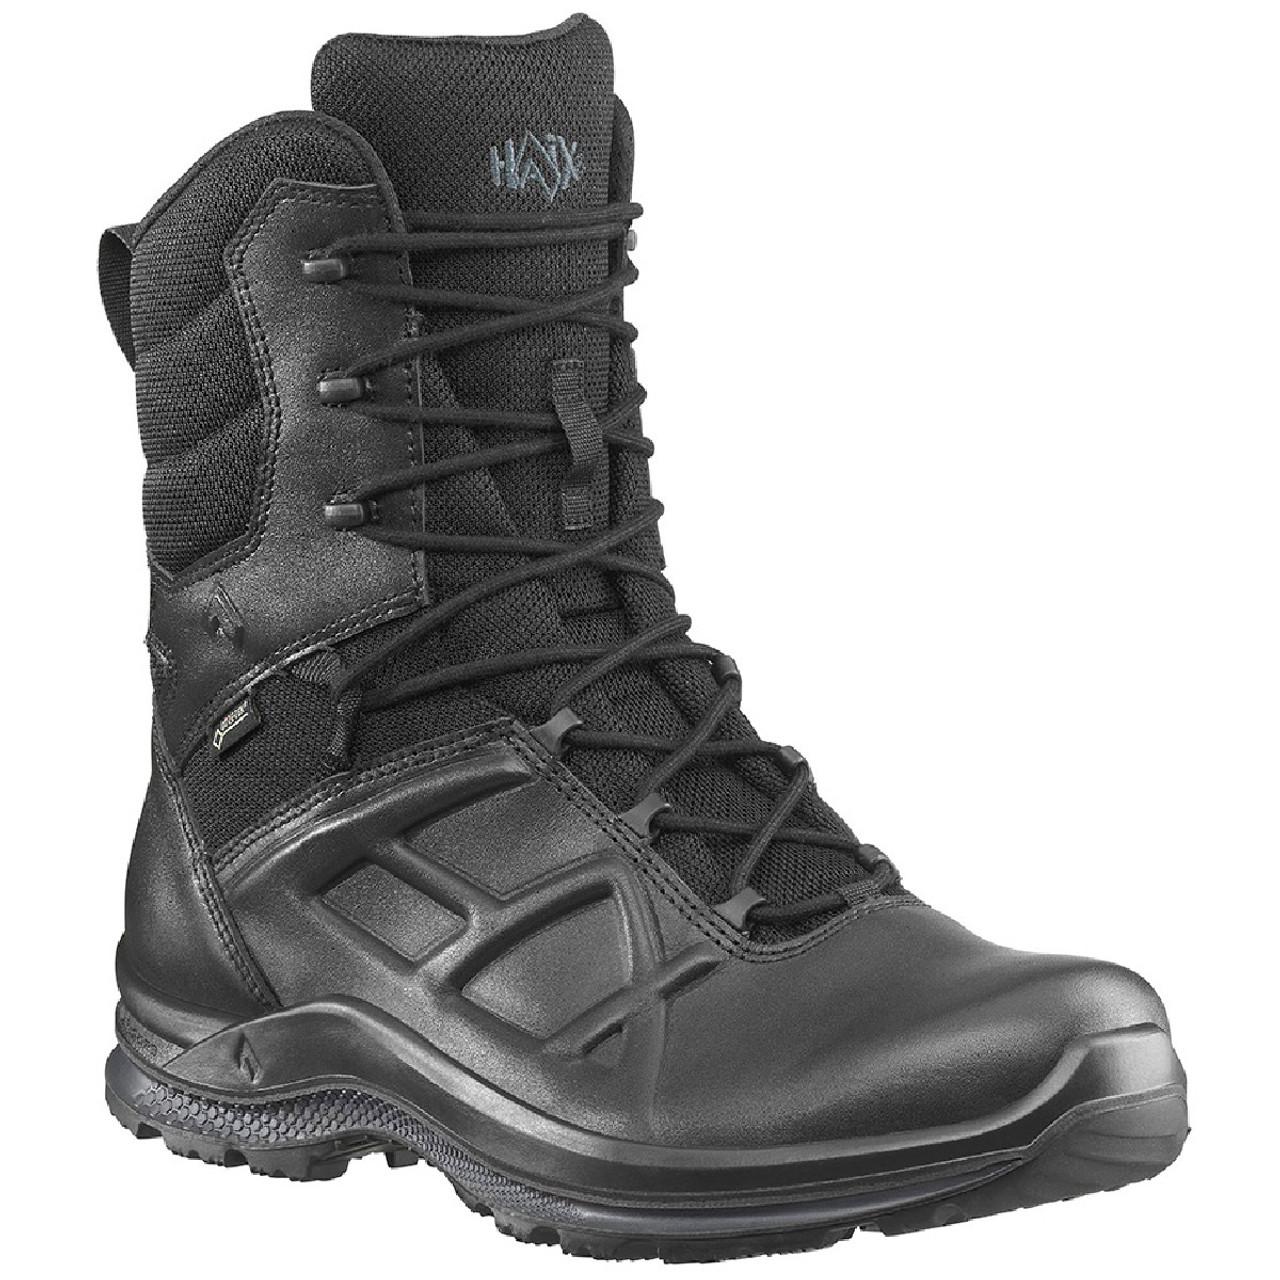 Haix Men's Black Eagle Tactical 2.0 GTX High Side Zip Waterproof 8